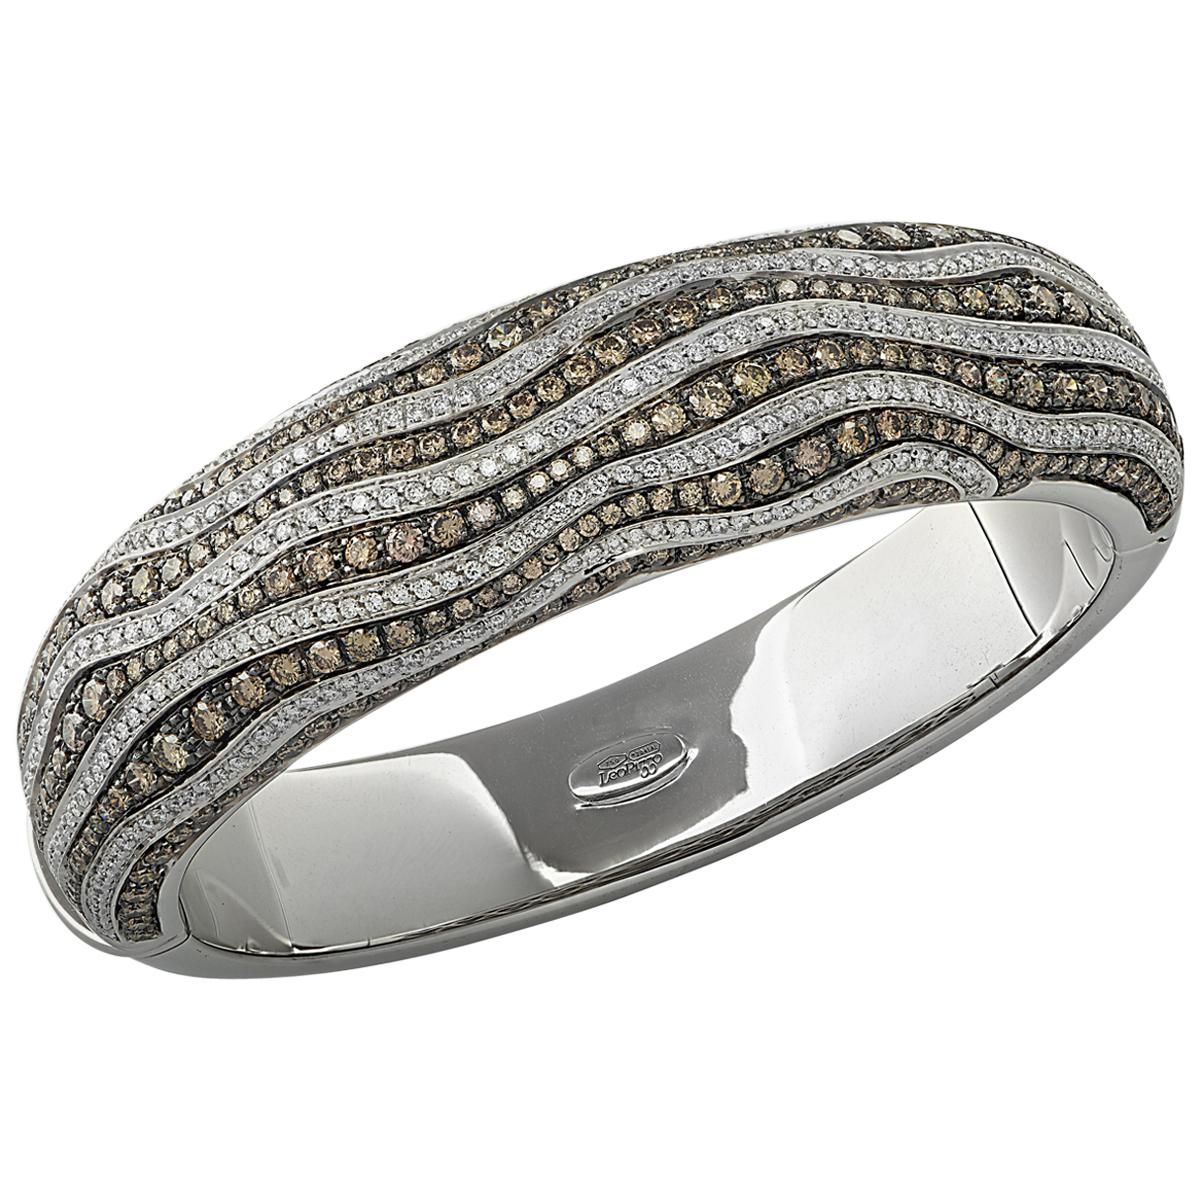 Leo Pizzo Italy 7 Carat Diamond Bangle Bracelet